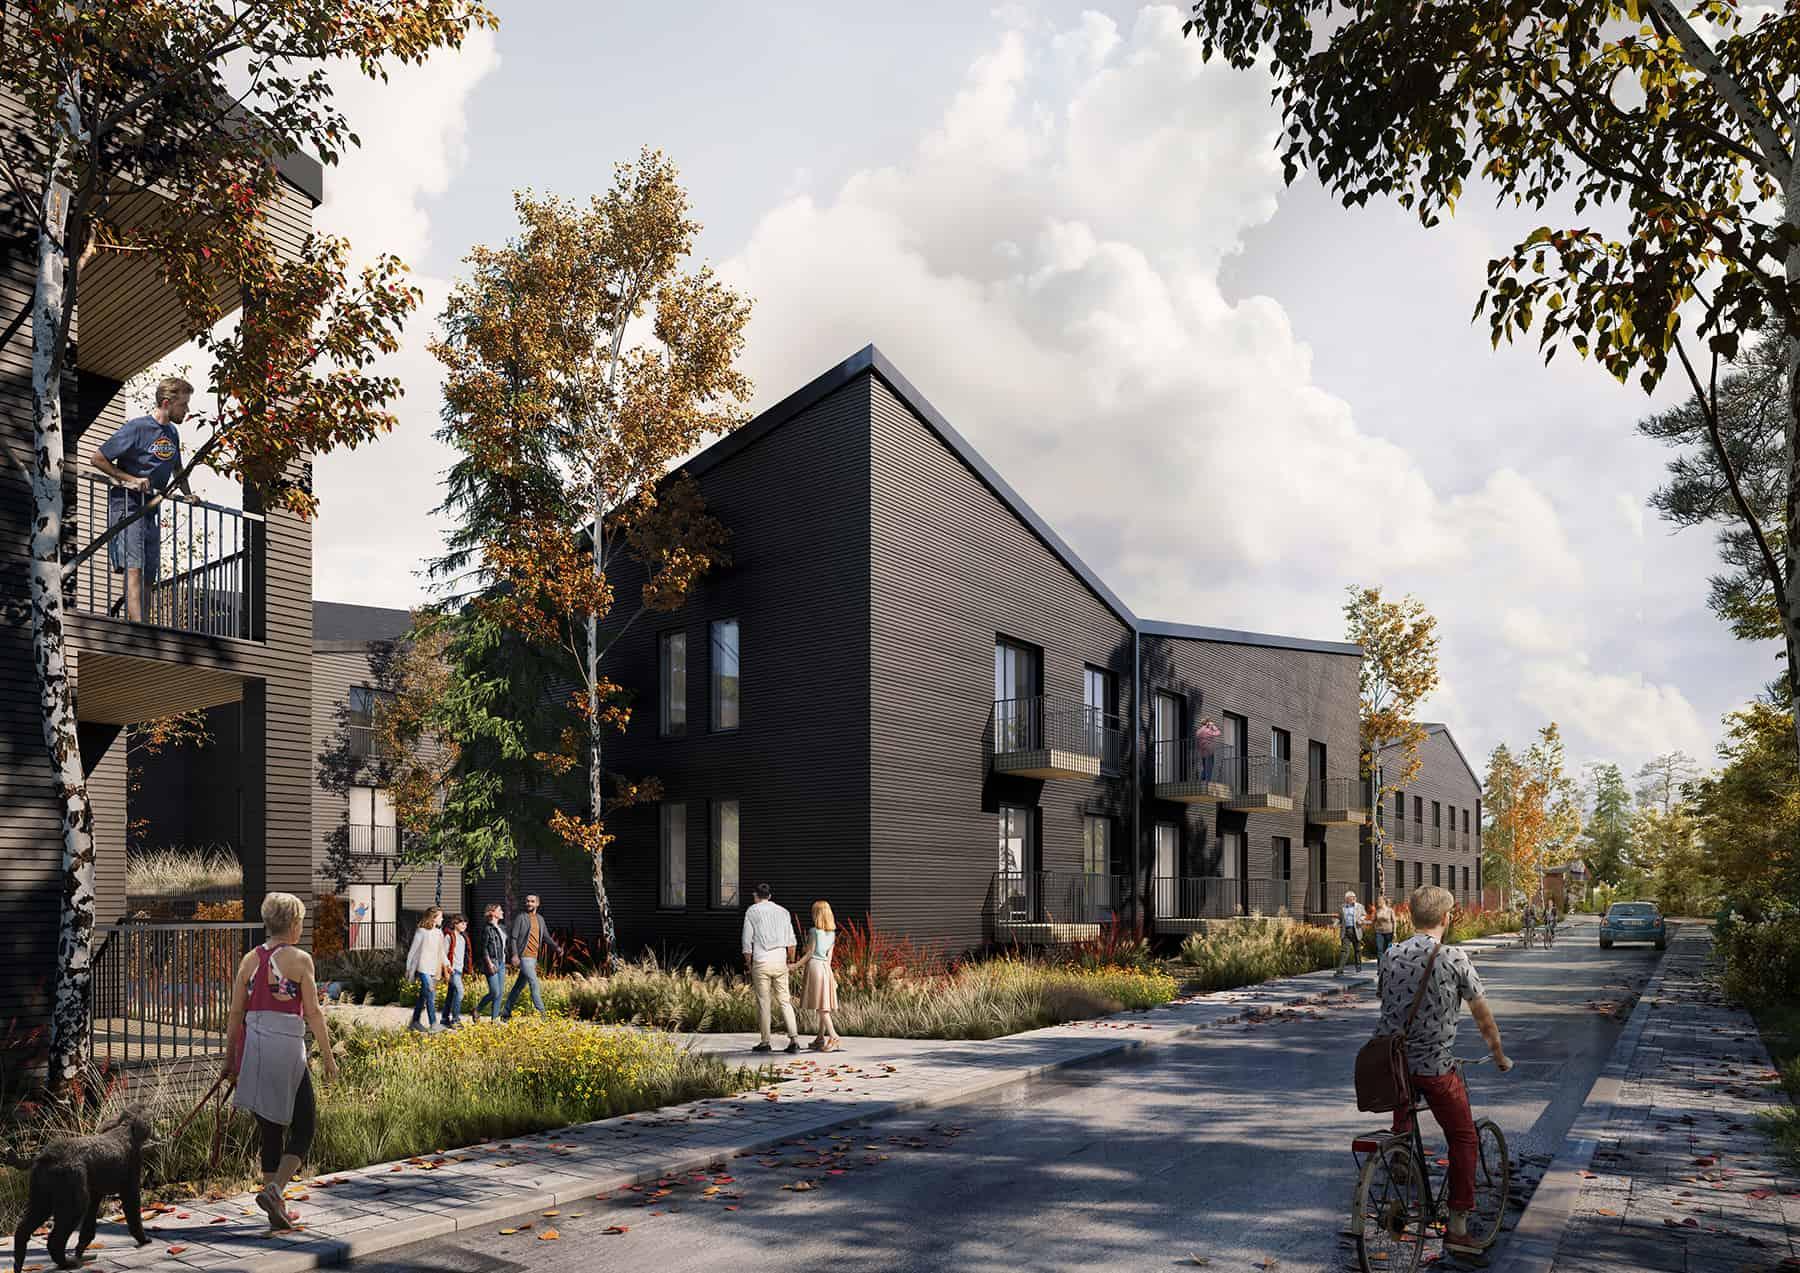 Finland • Apartments • Wood Facade